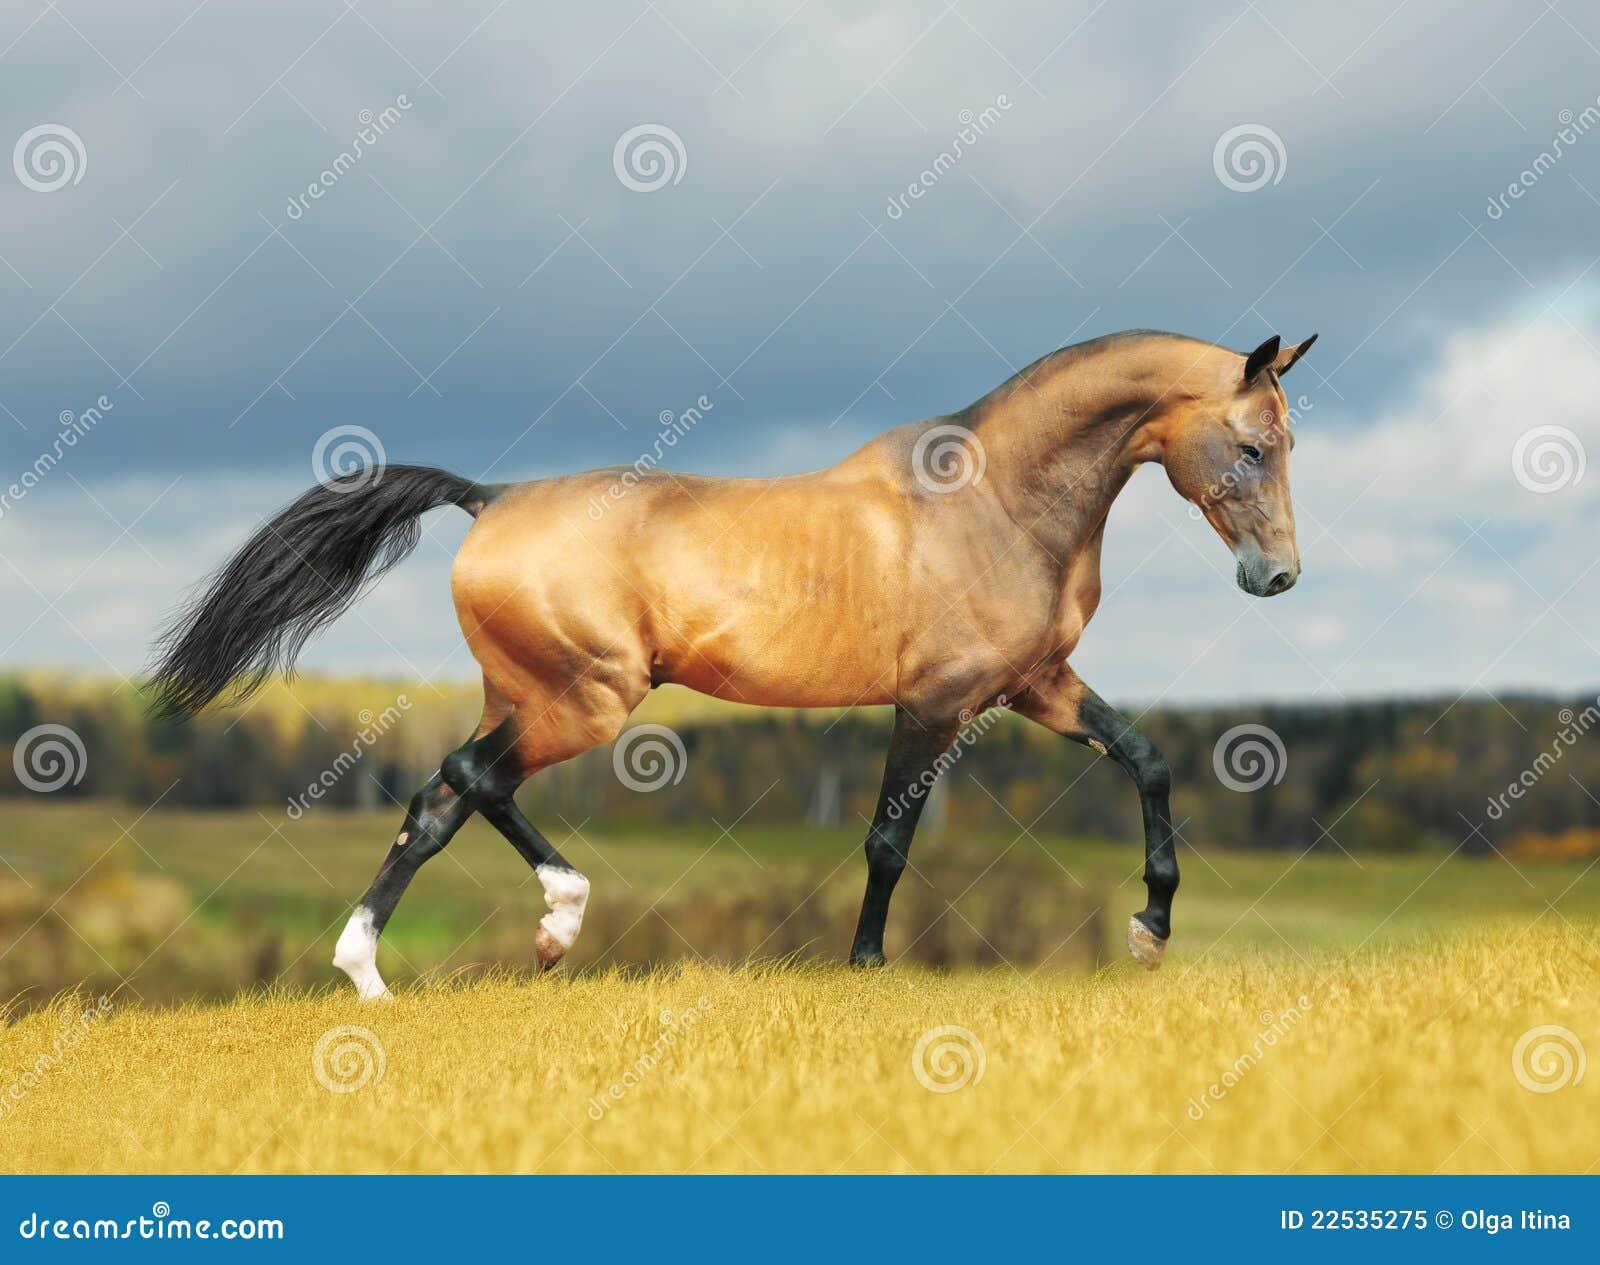 Akhal-teke horse in autumn